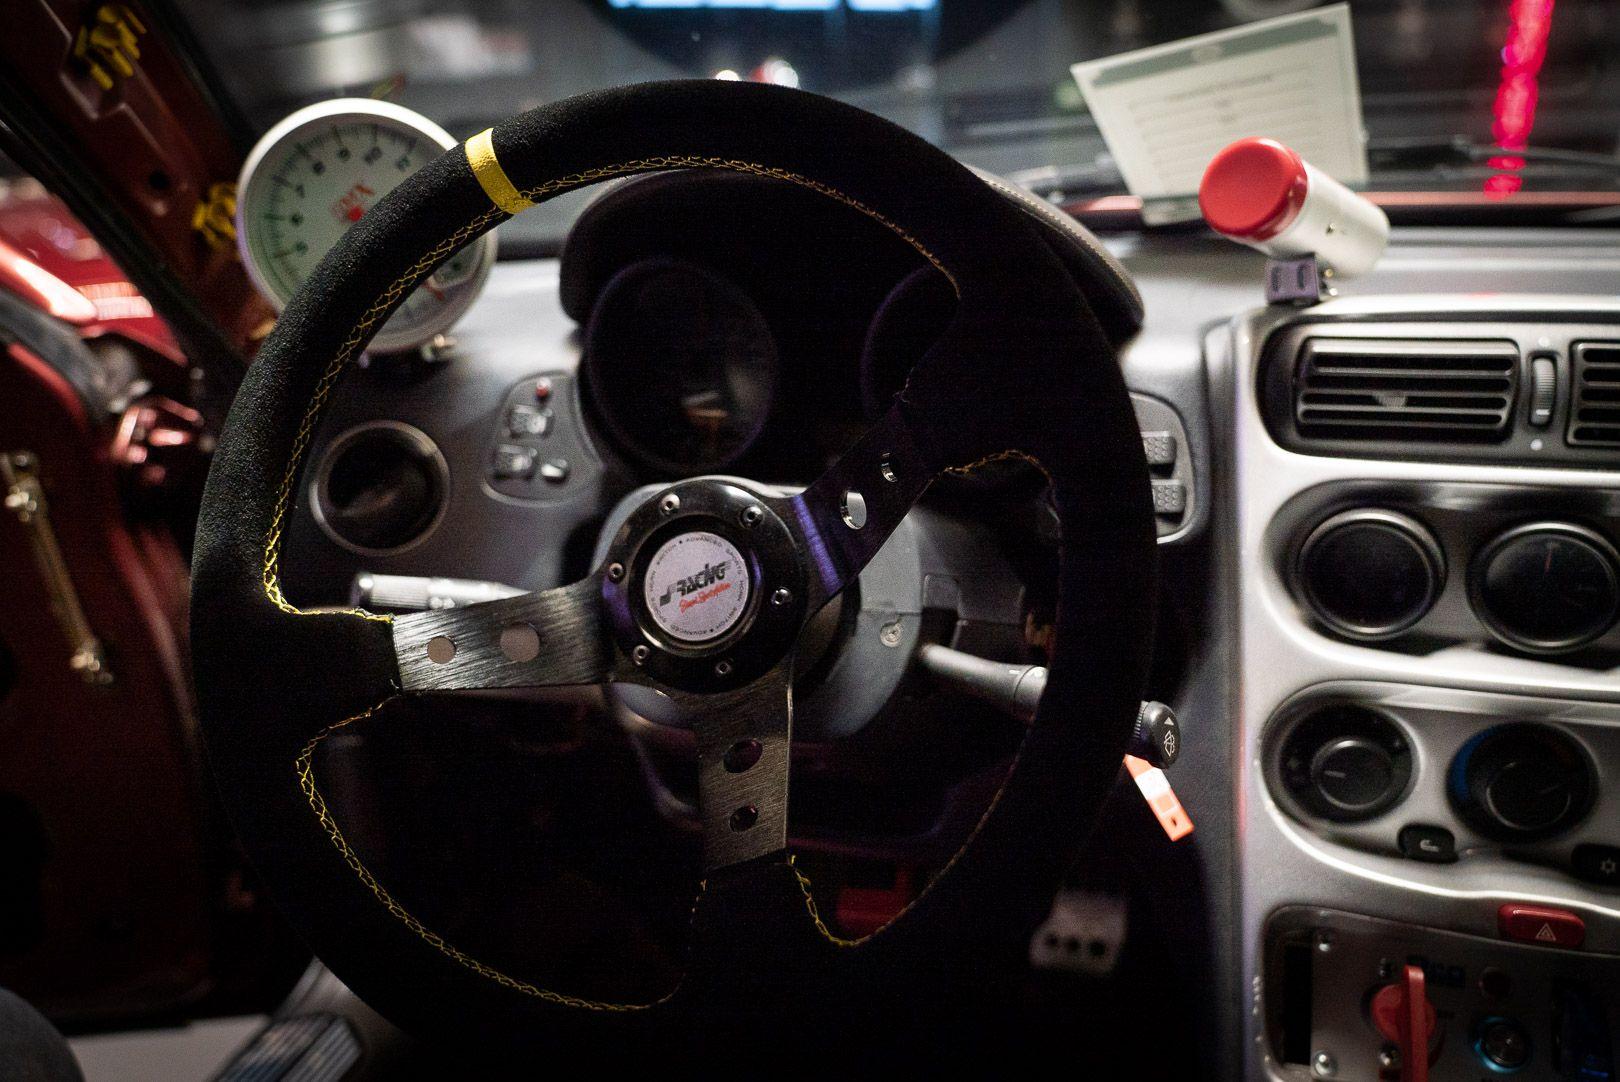 1995 Alfa Romeo GTV 2.0 V6 Turbo Cup Replica 59931